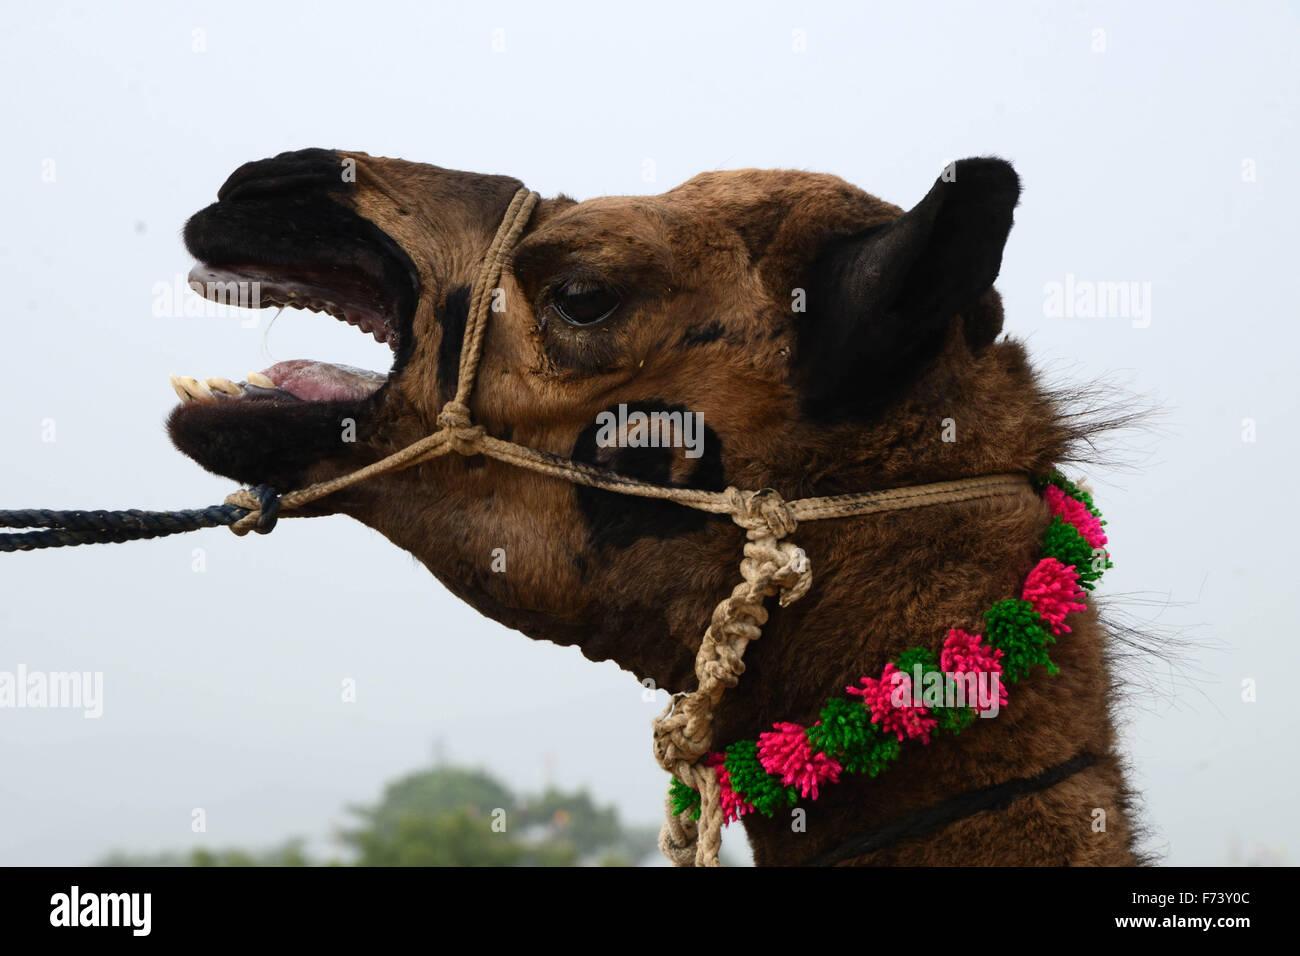 Camel en bétail, pushkar fair, Rajasthan, Inde, Asie Photo Stock